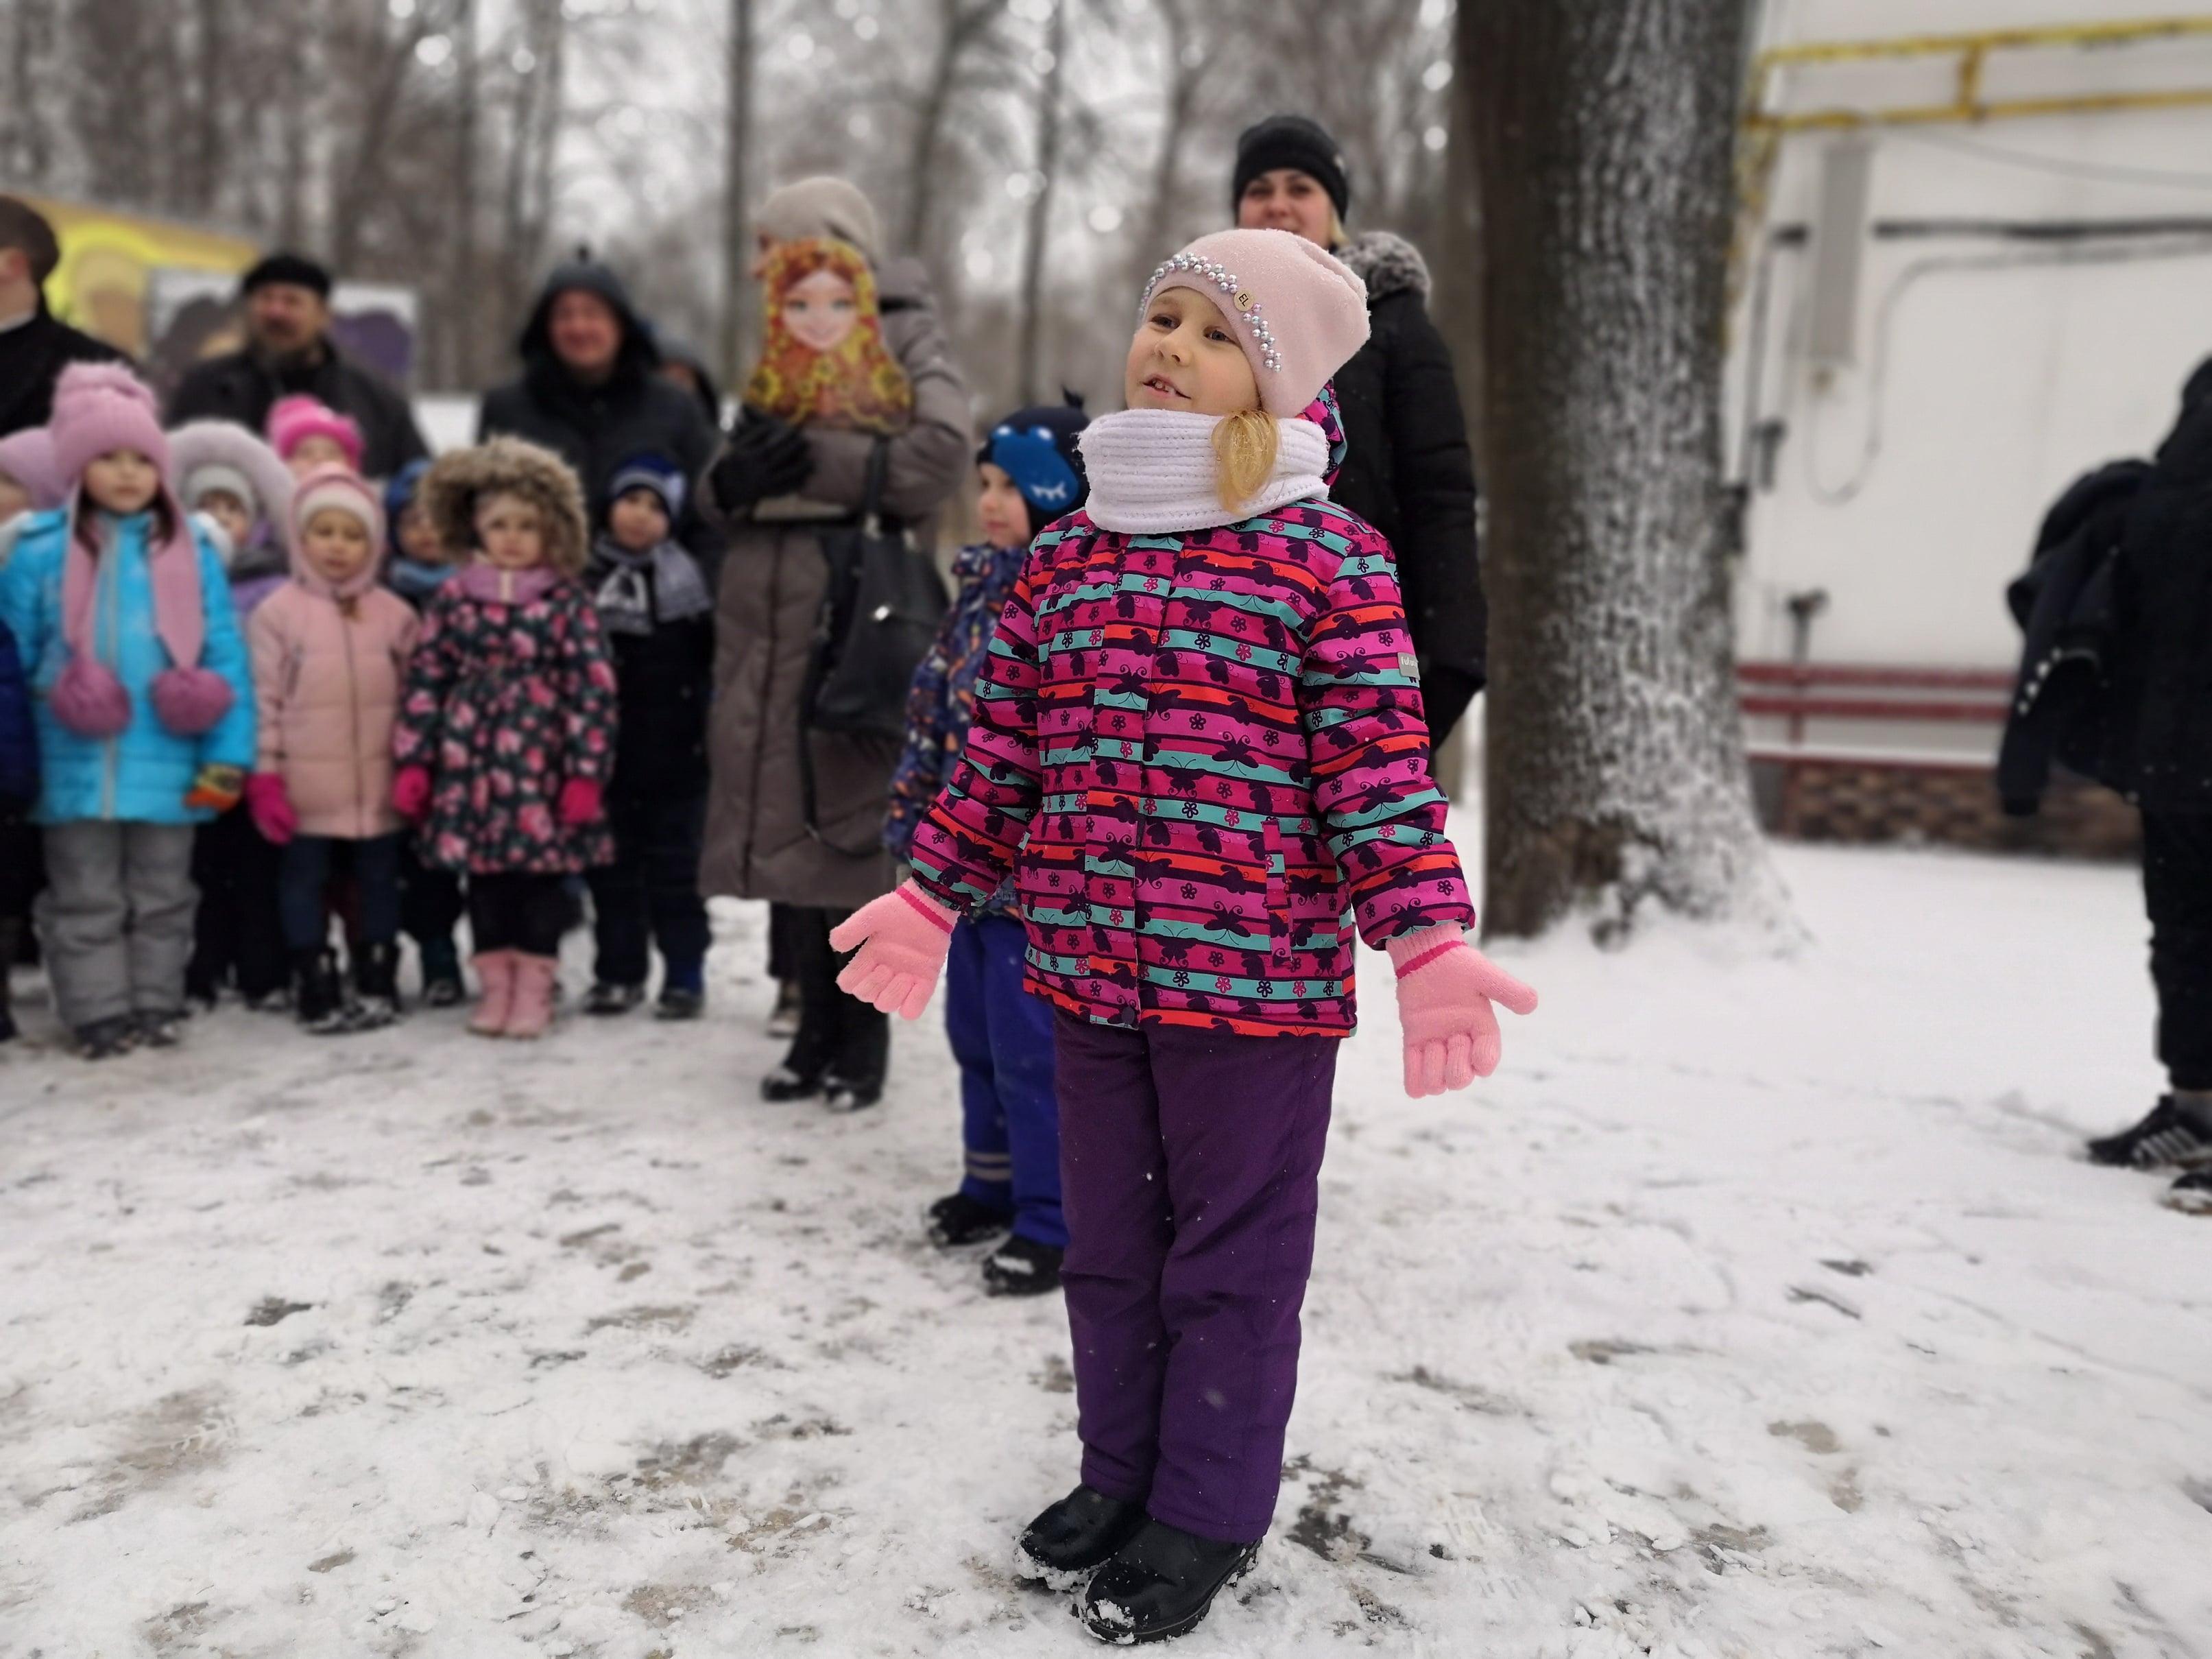 http://monuspen.ru/photoreports/b3aa9199fb88f725c81fb67701ac2ff5.jpg